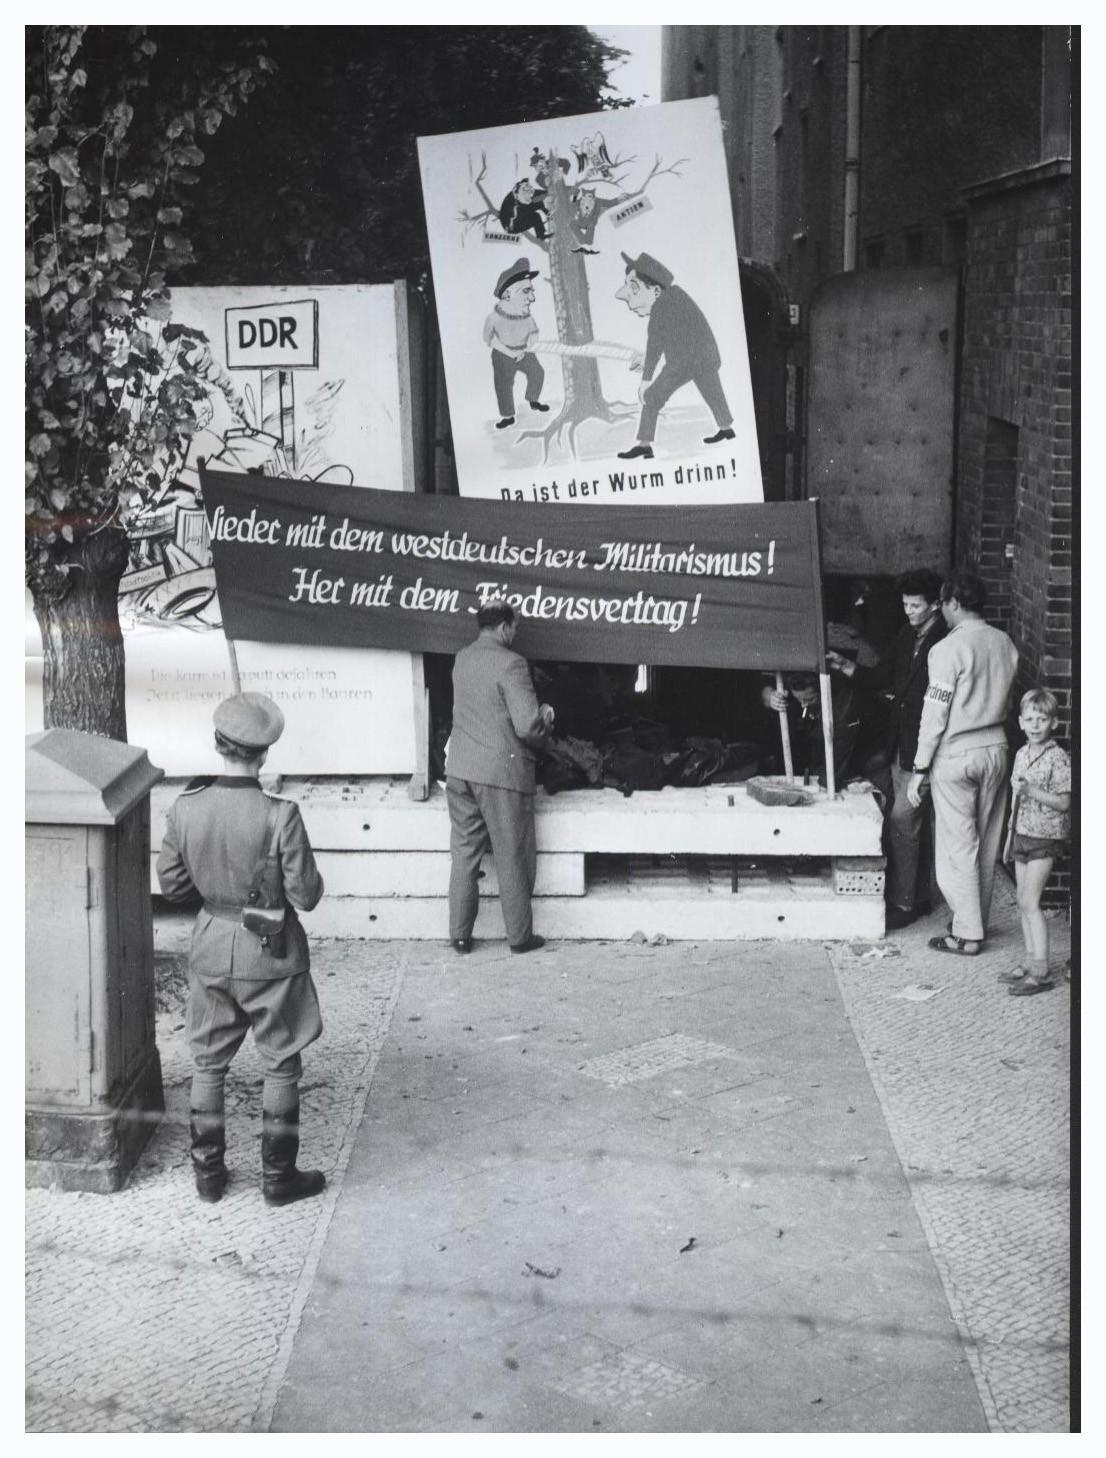 September 1961: Plakat in Ost-Deutschland